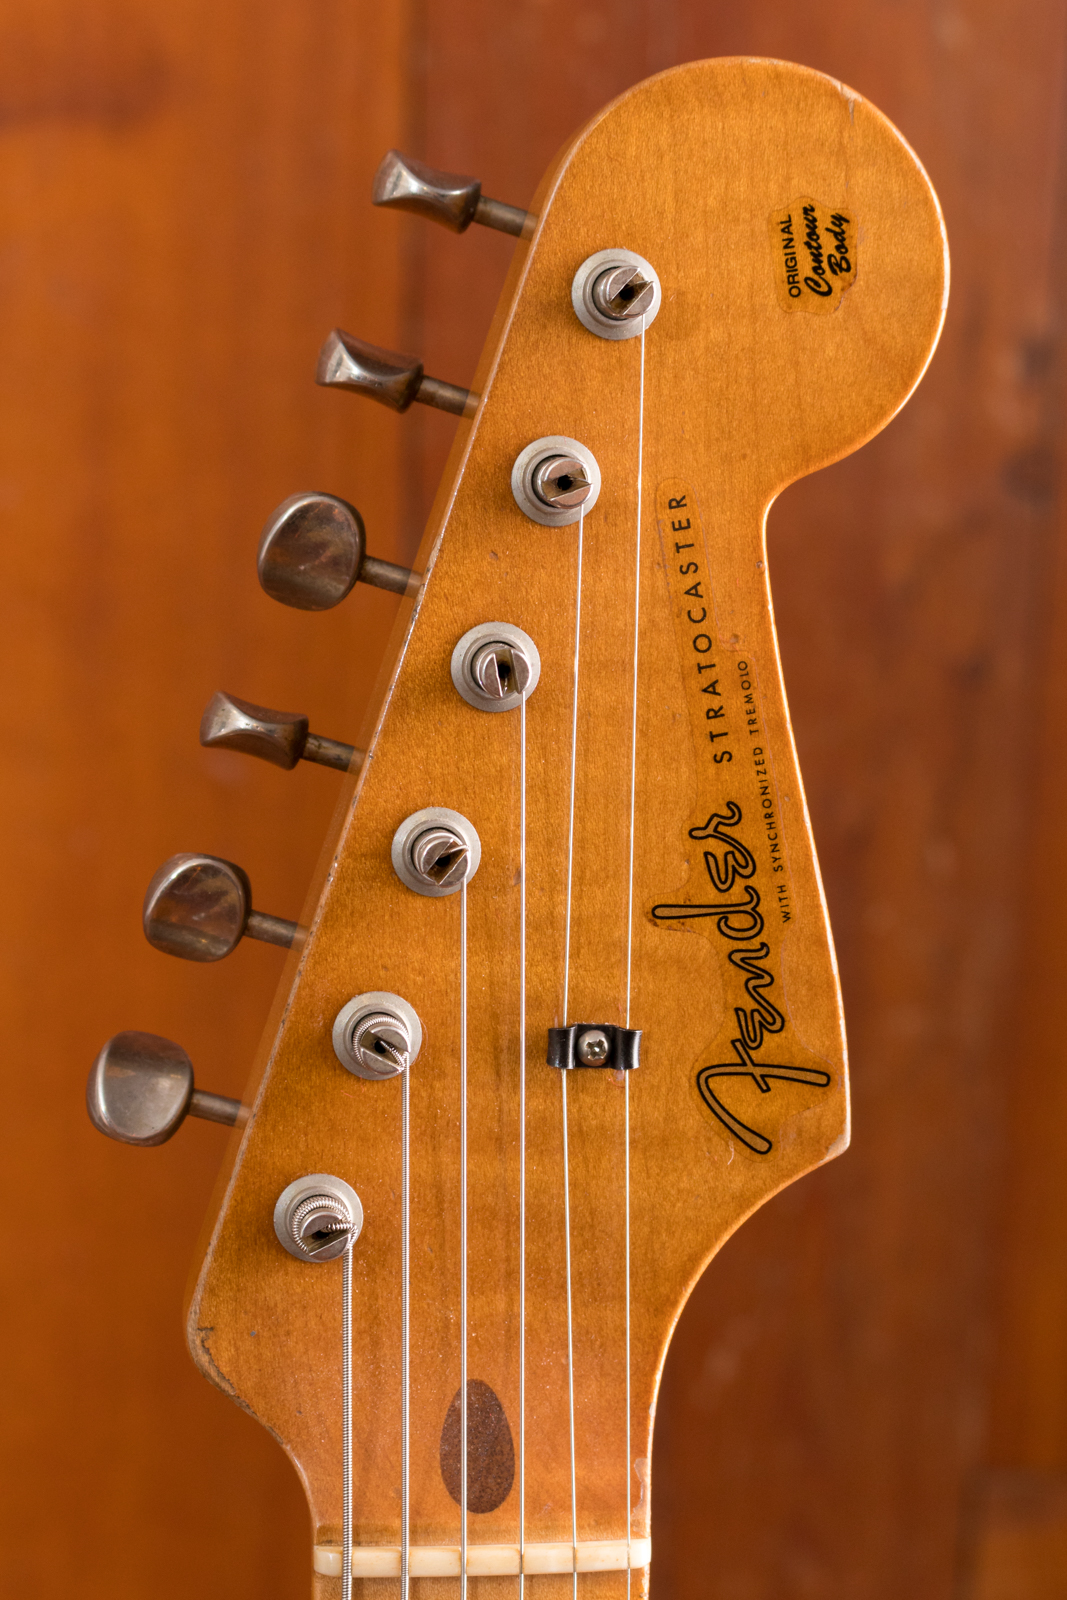 Fender Custom Shop Stratocaster 2018 Guitar For Sale Max Guitar